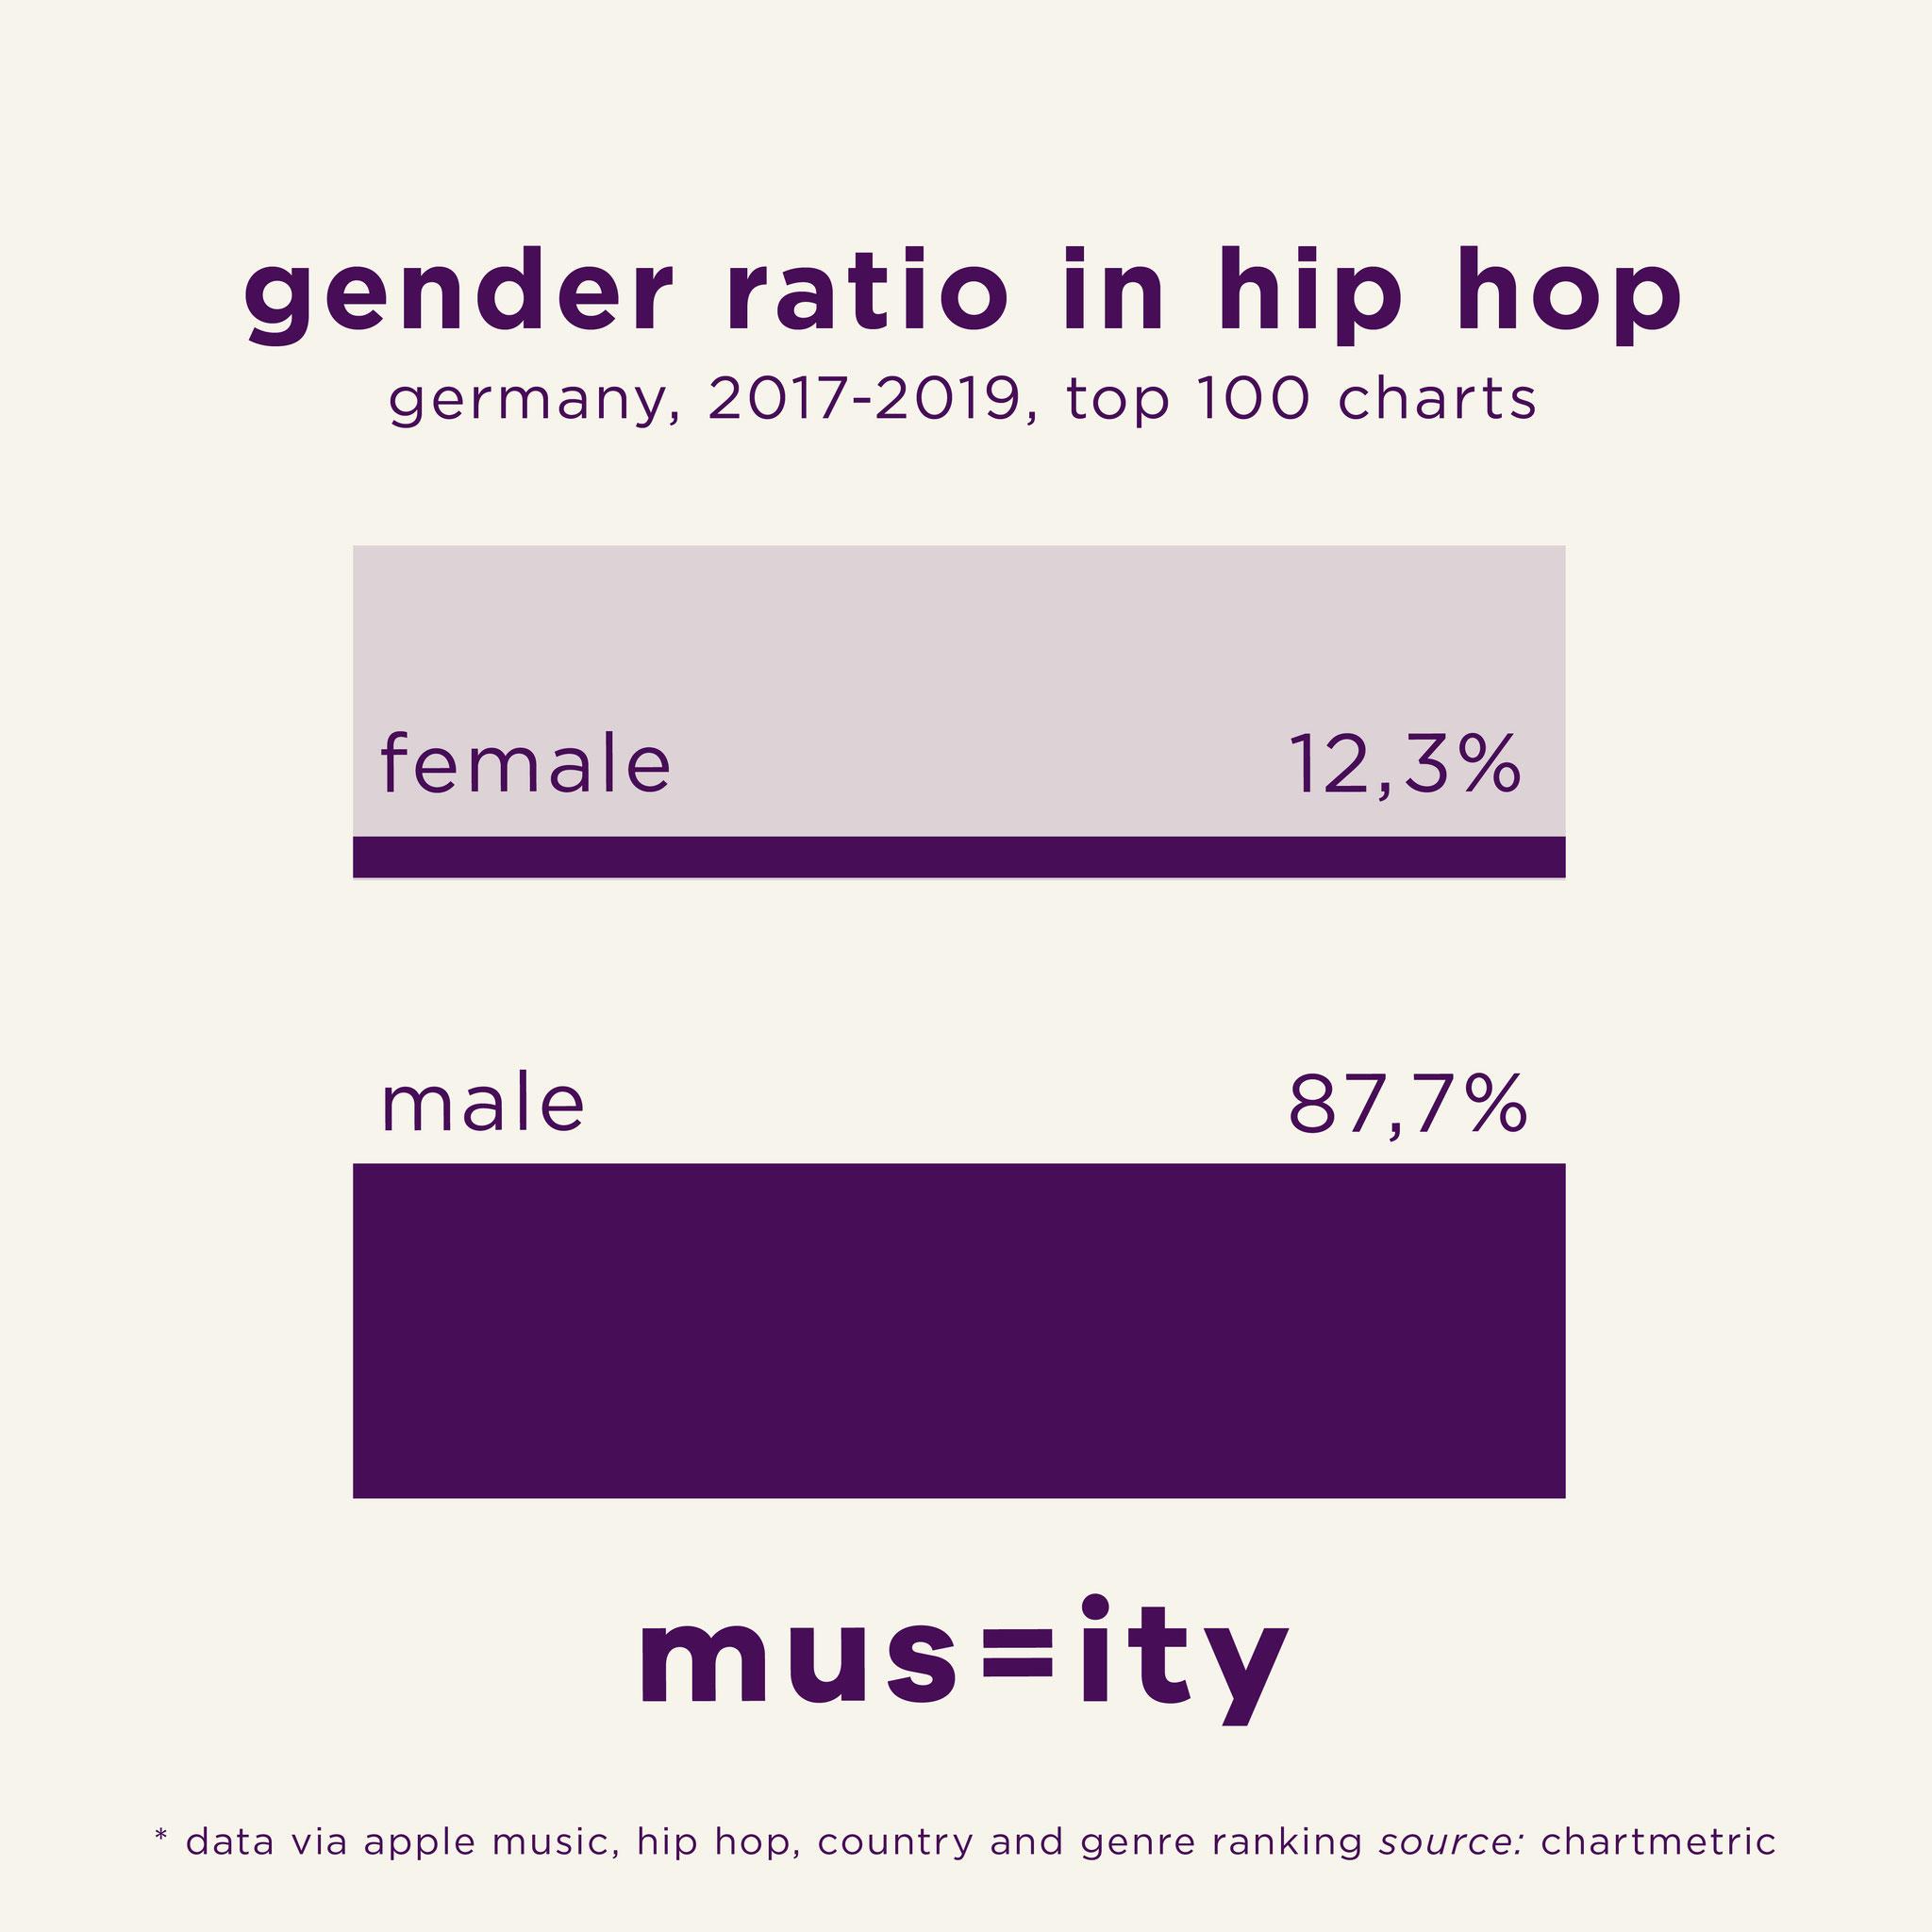 (c) musequality